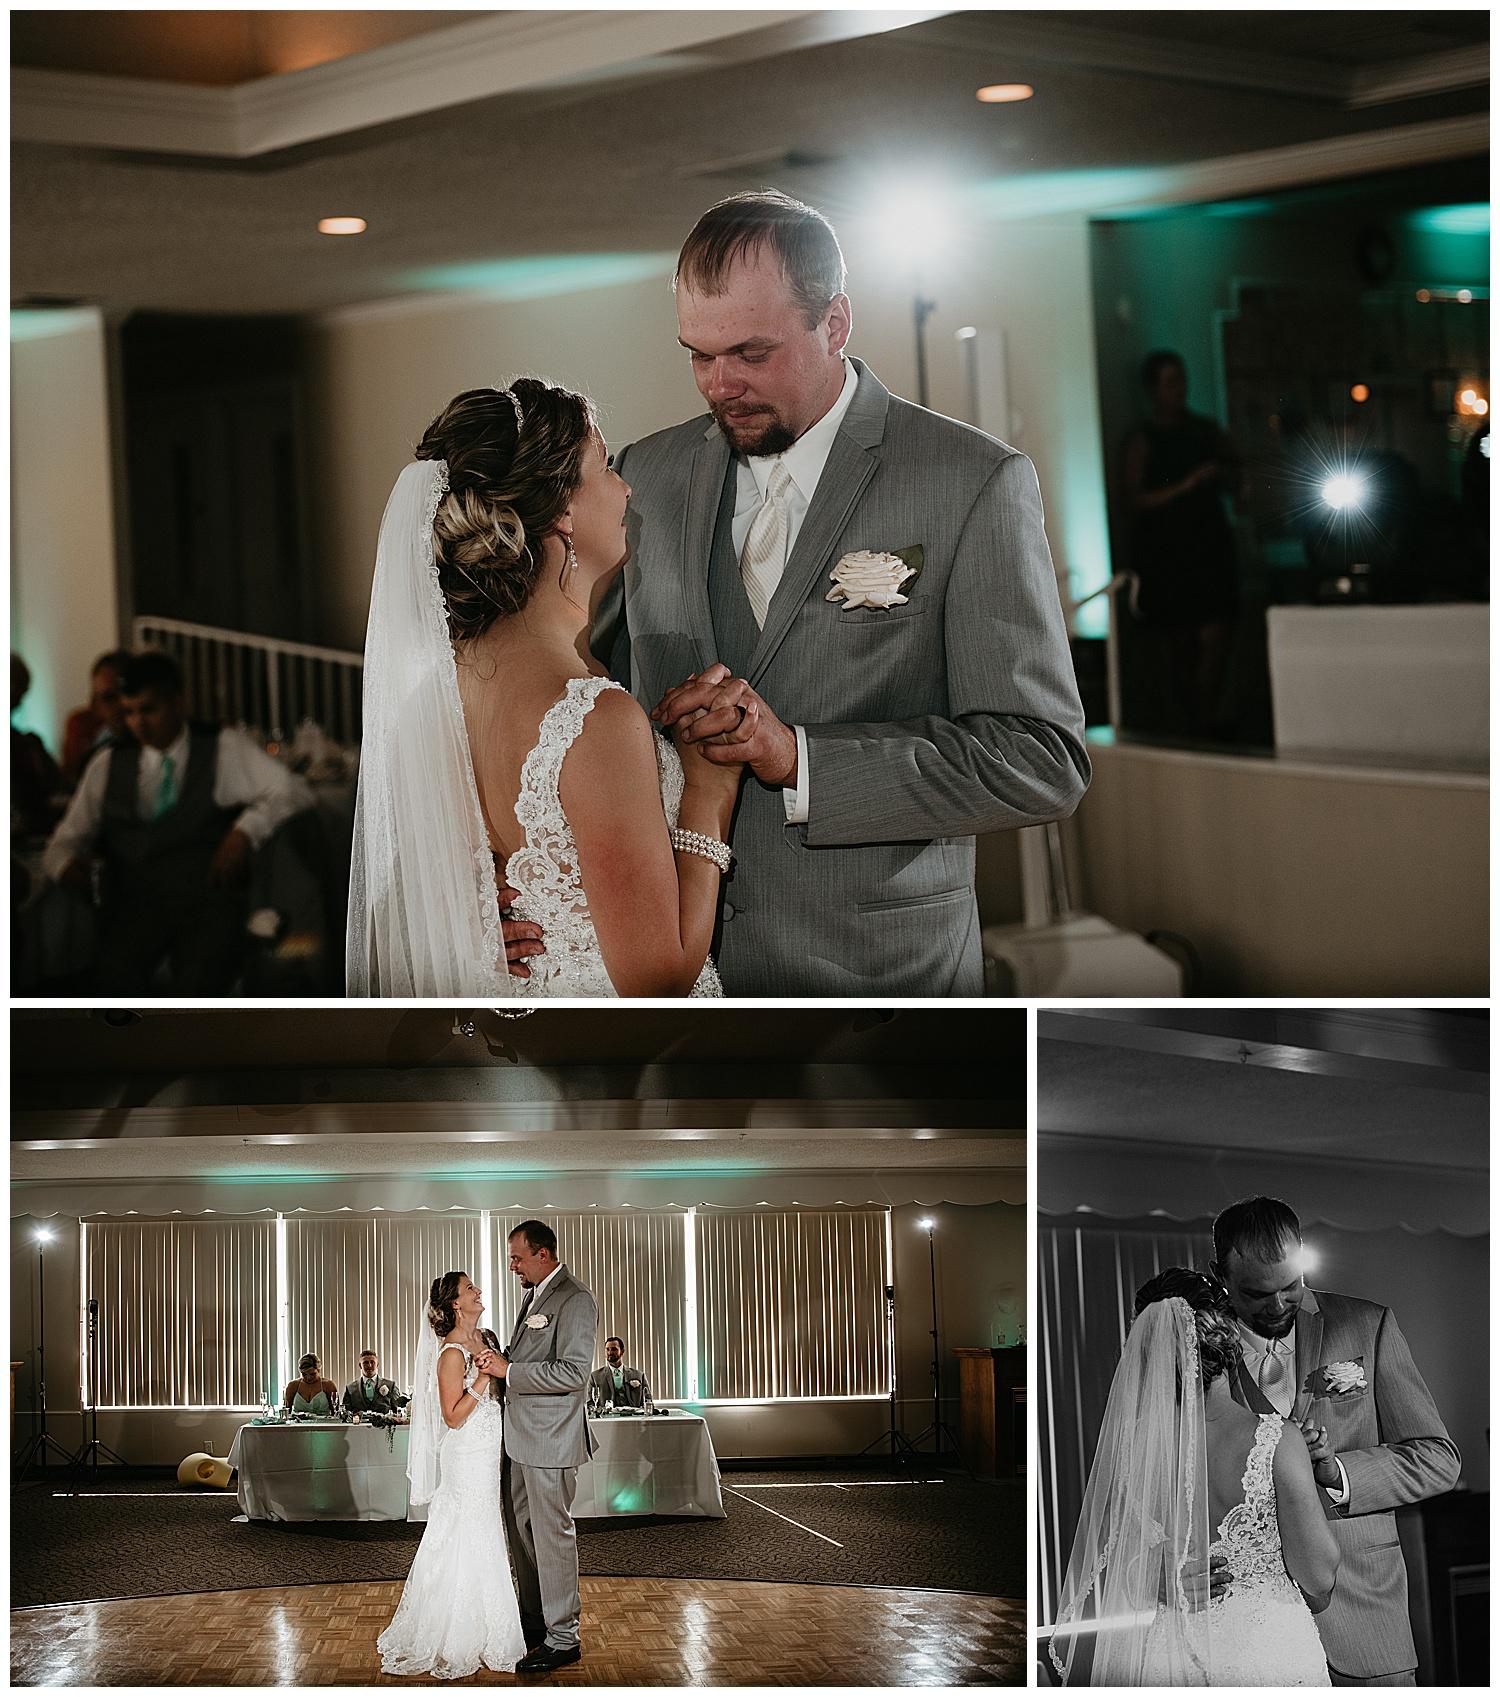 NEPA-Lehigh-Valley-Wedding-Photographer-at-Fountain-Springs-Country-Inn-Ashland-PA_0052.jpg